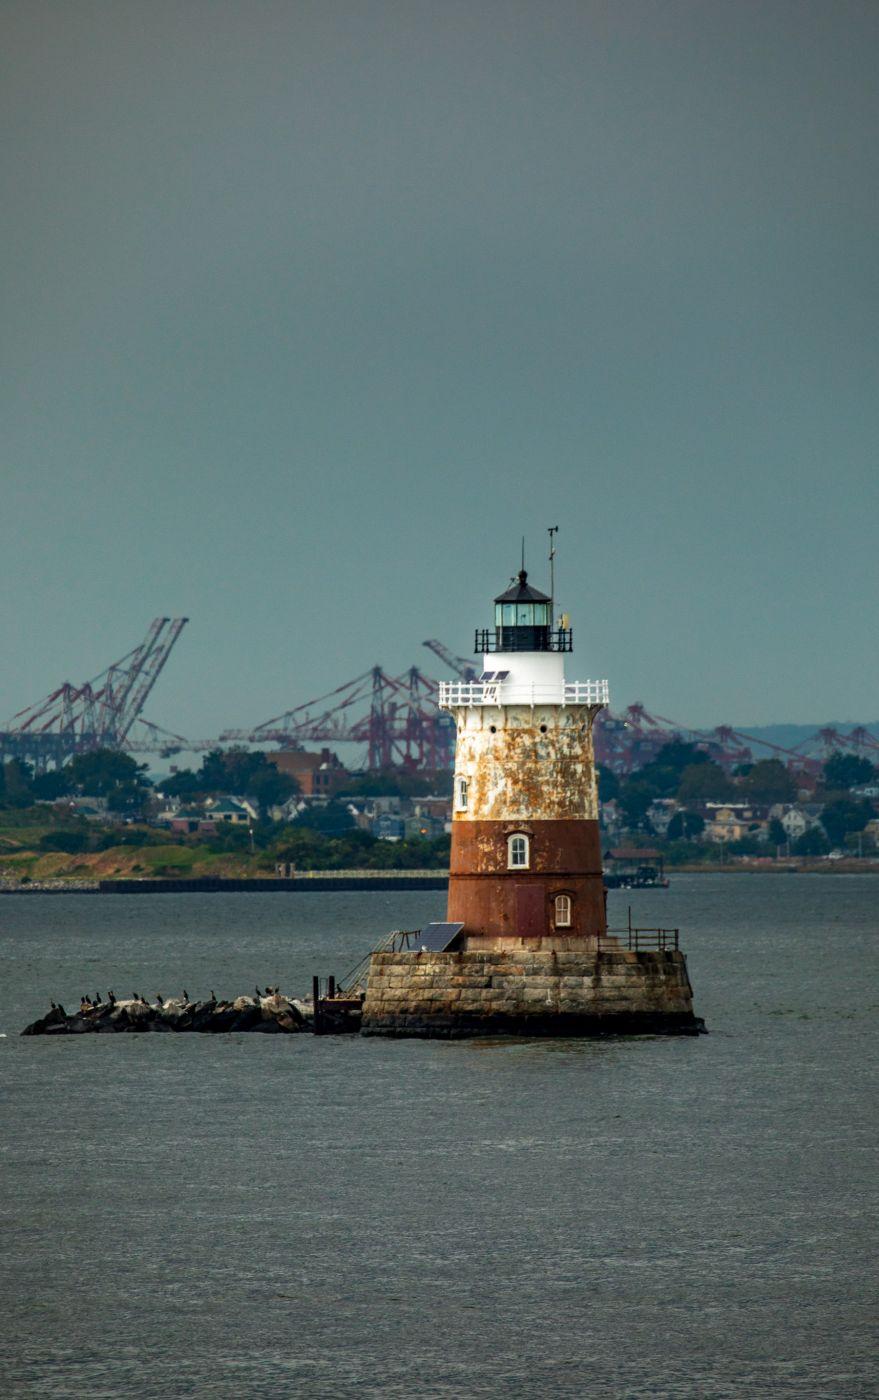 Romer Shoal Light Lower Manhattan to Staten Island, New York, USA